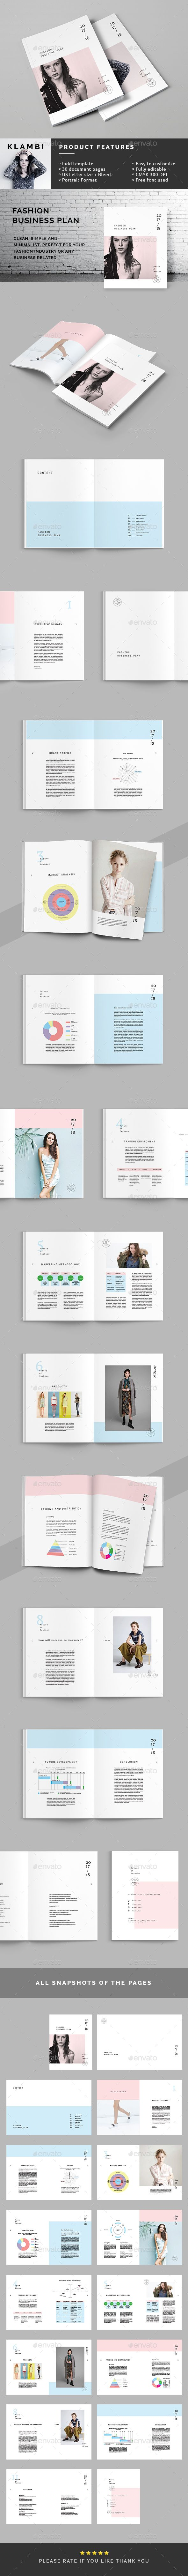 Best 25+ Business plan layout ideas on Pinterest